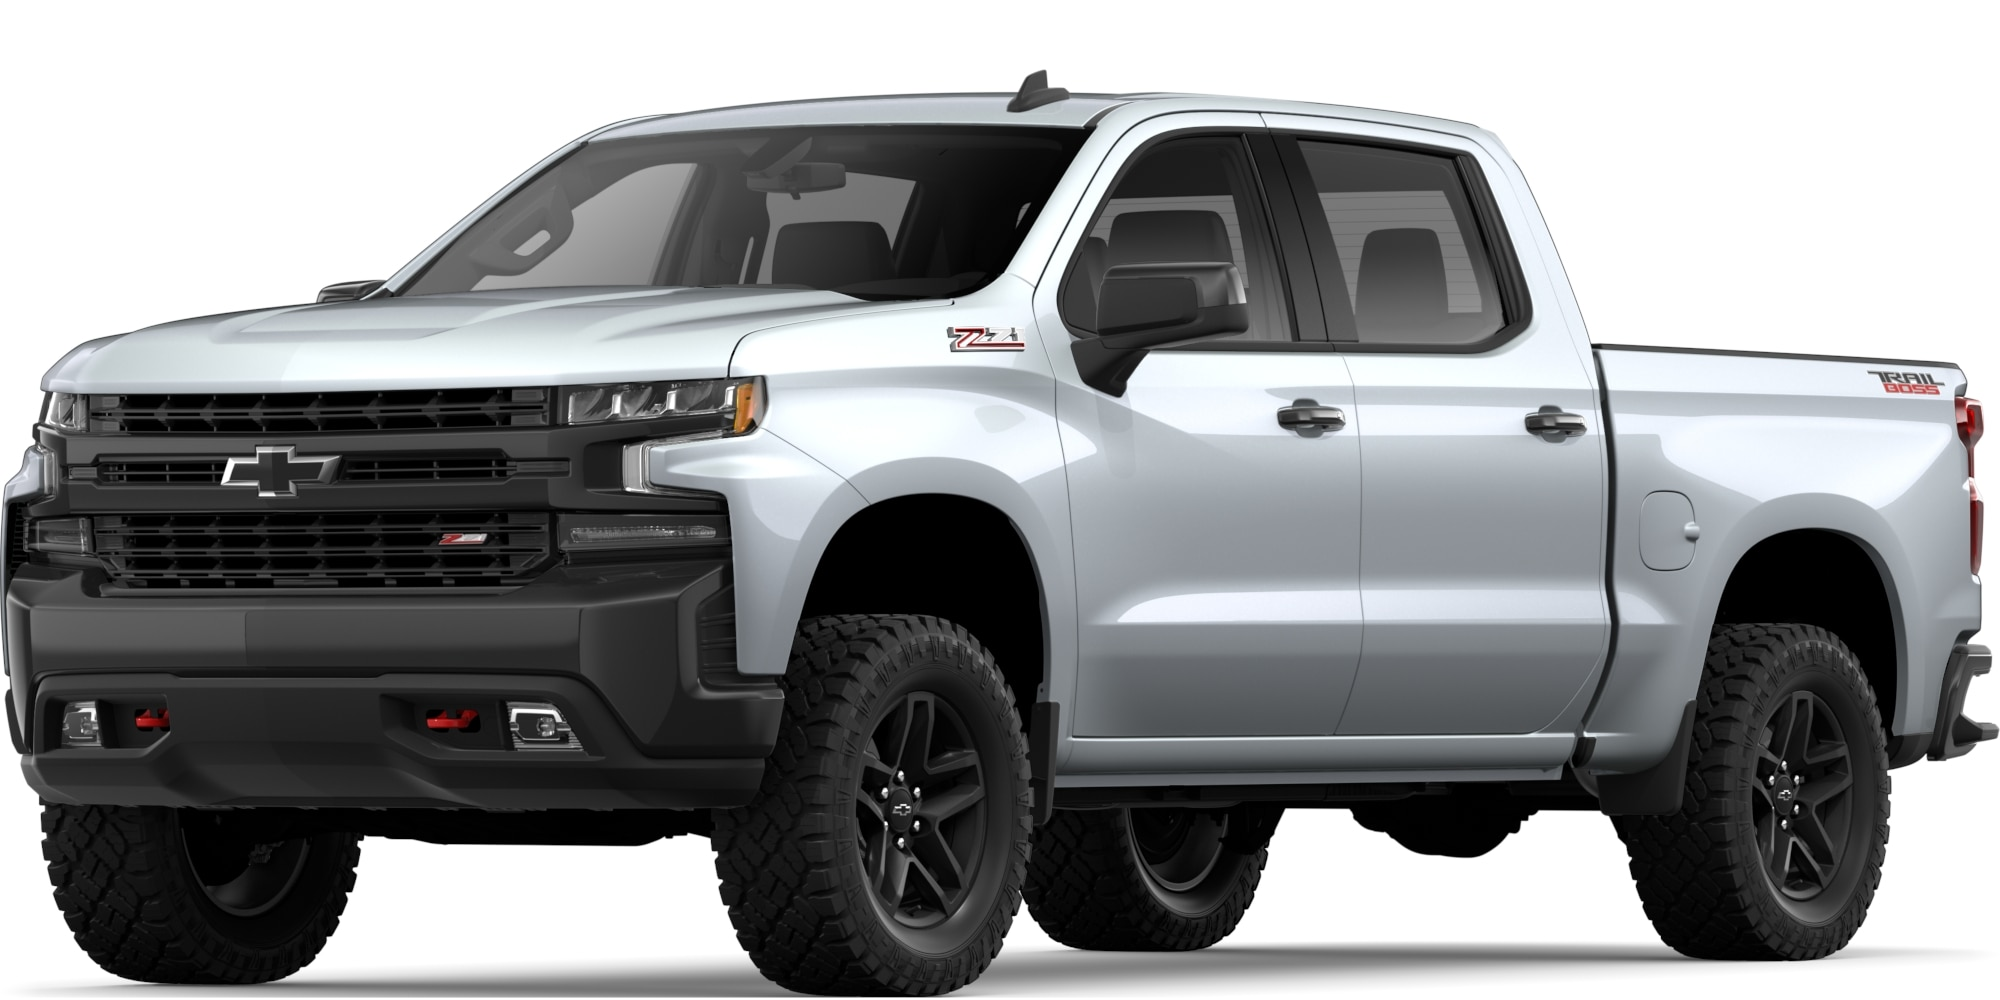 la totalmente nueva camioneta pickup silverado 1500 2019. Black Bedroom Furniture Sets. Home Design Ideas